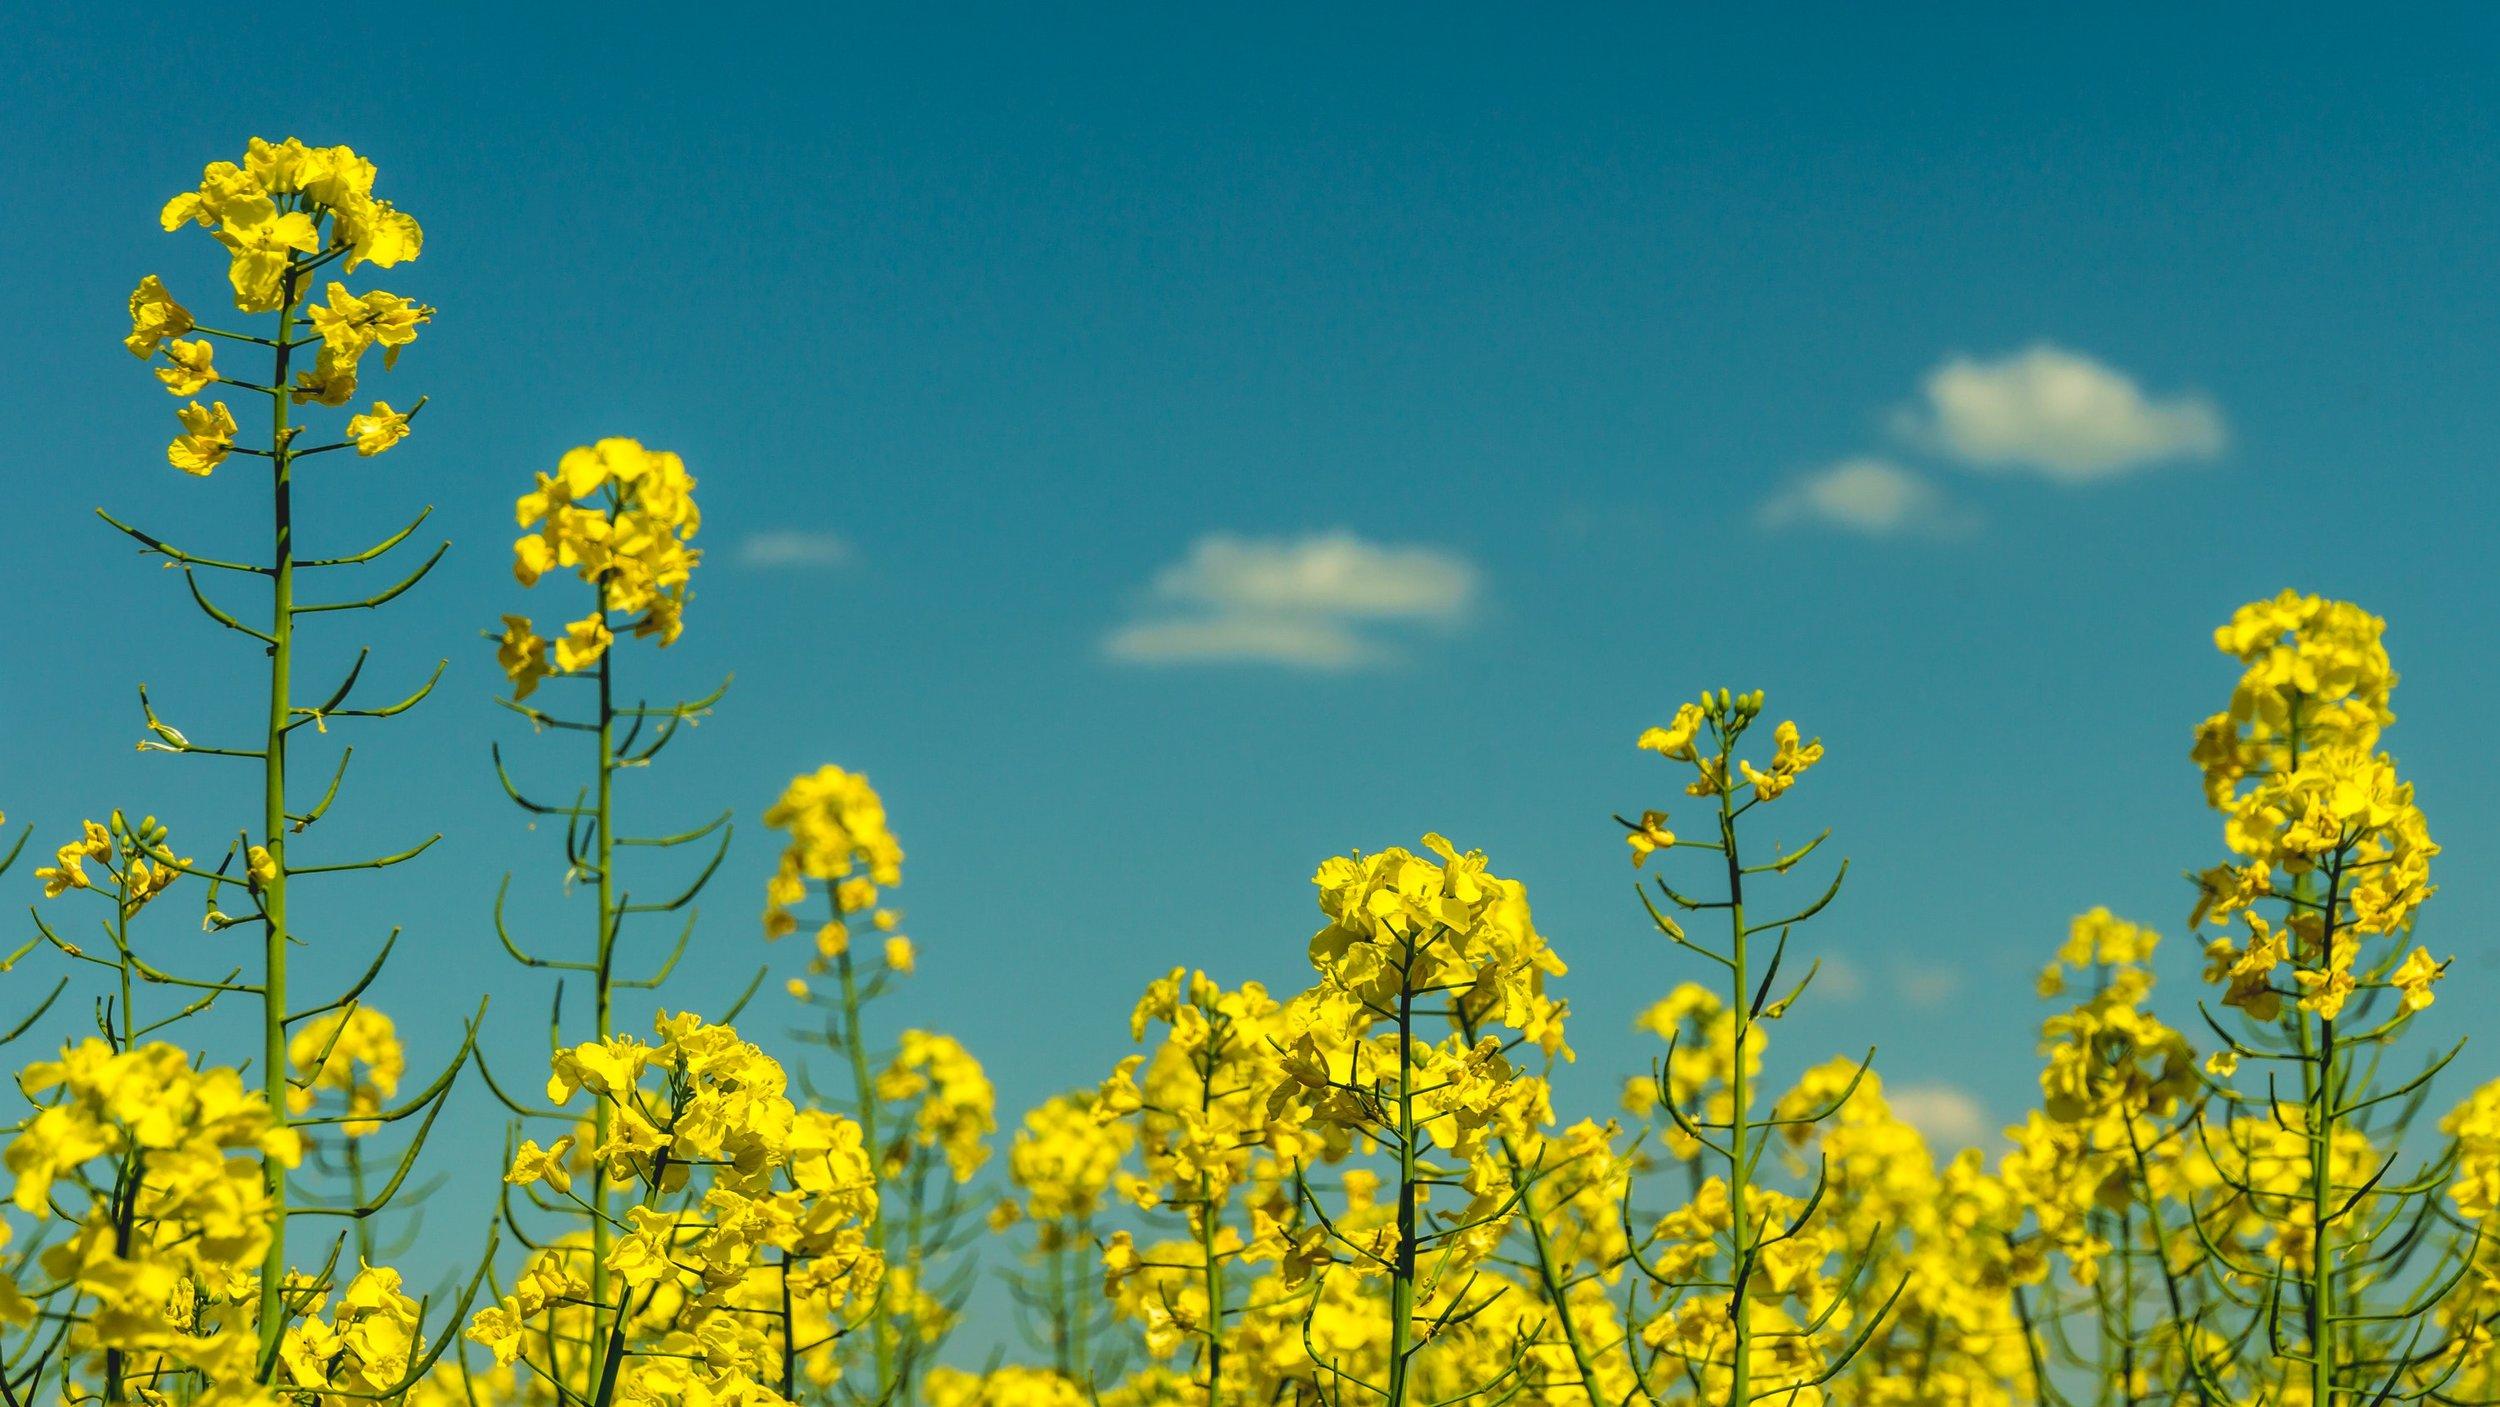 flora-flowers-nature-102083.jpg